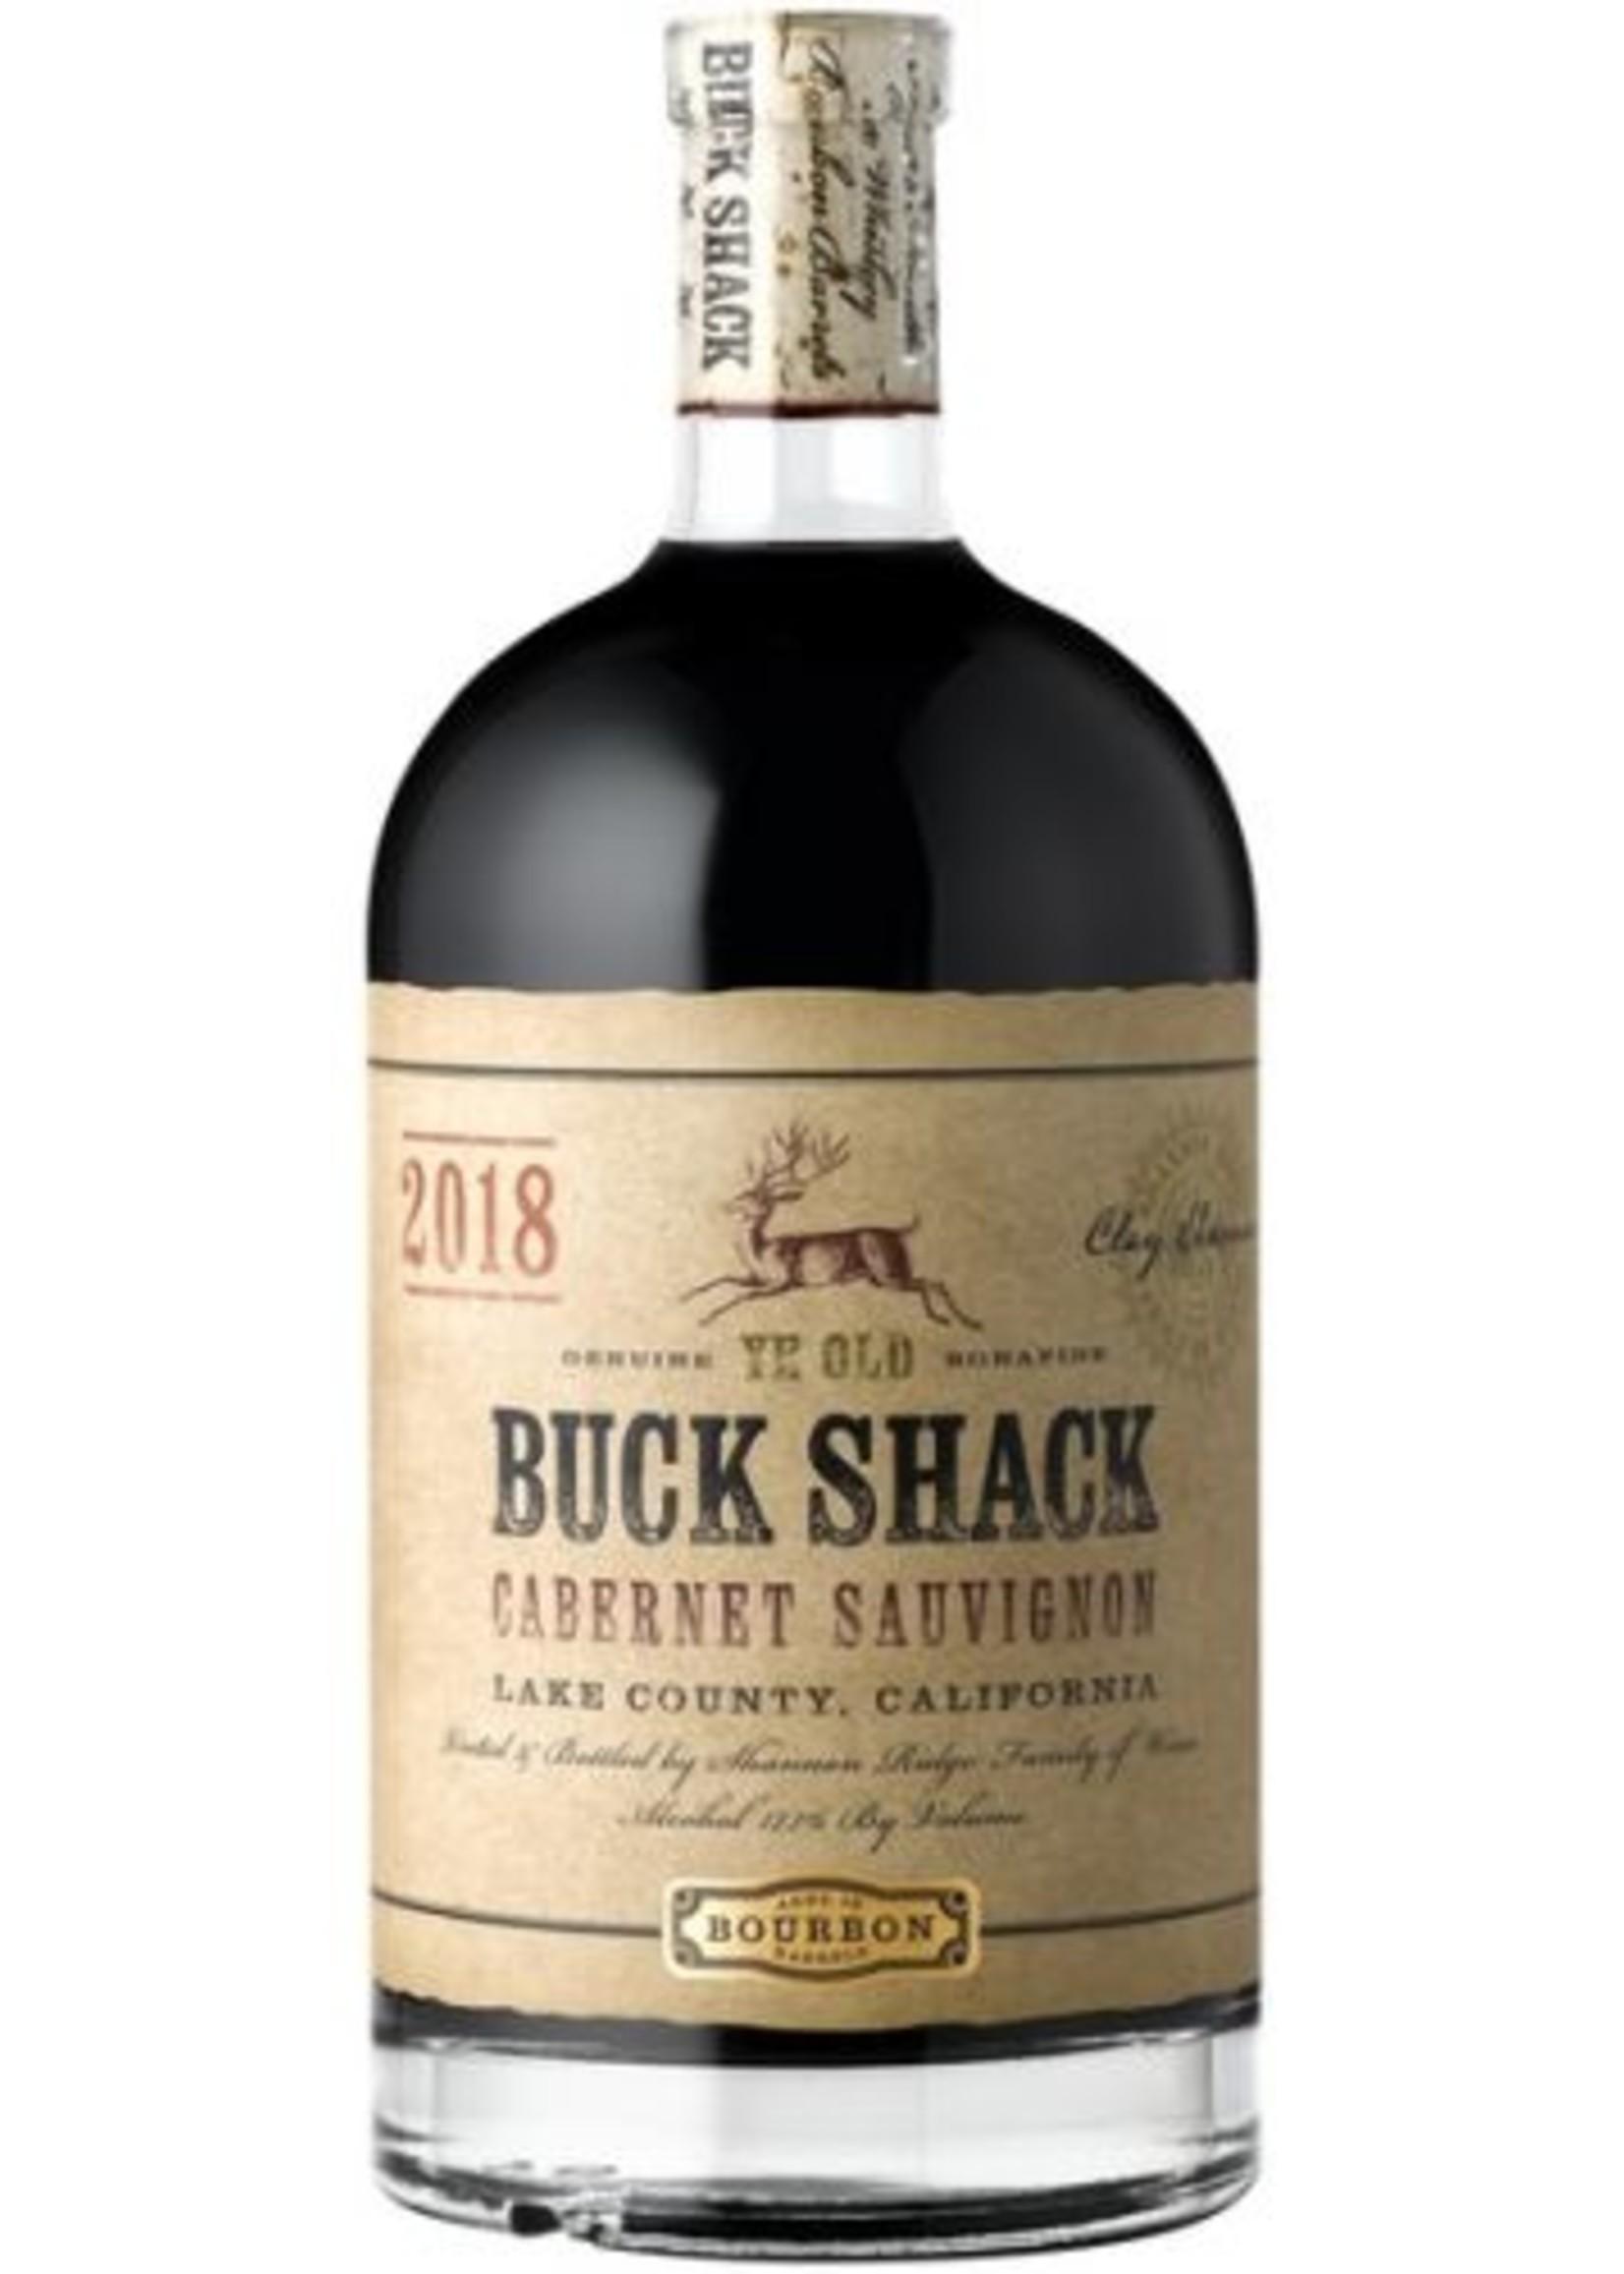 Buck Shack Bourbon Barrel Aged Cabernet Sauvignon